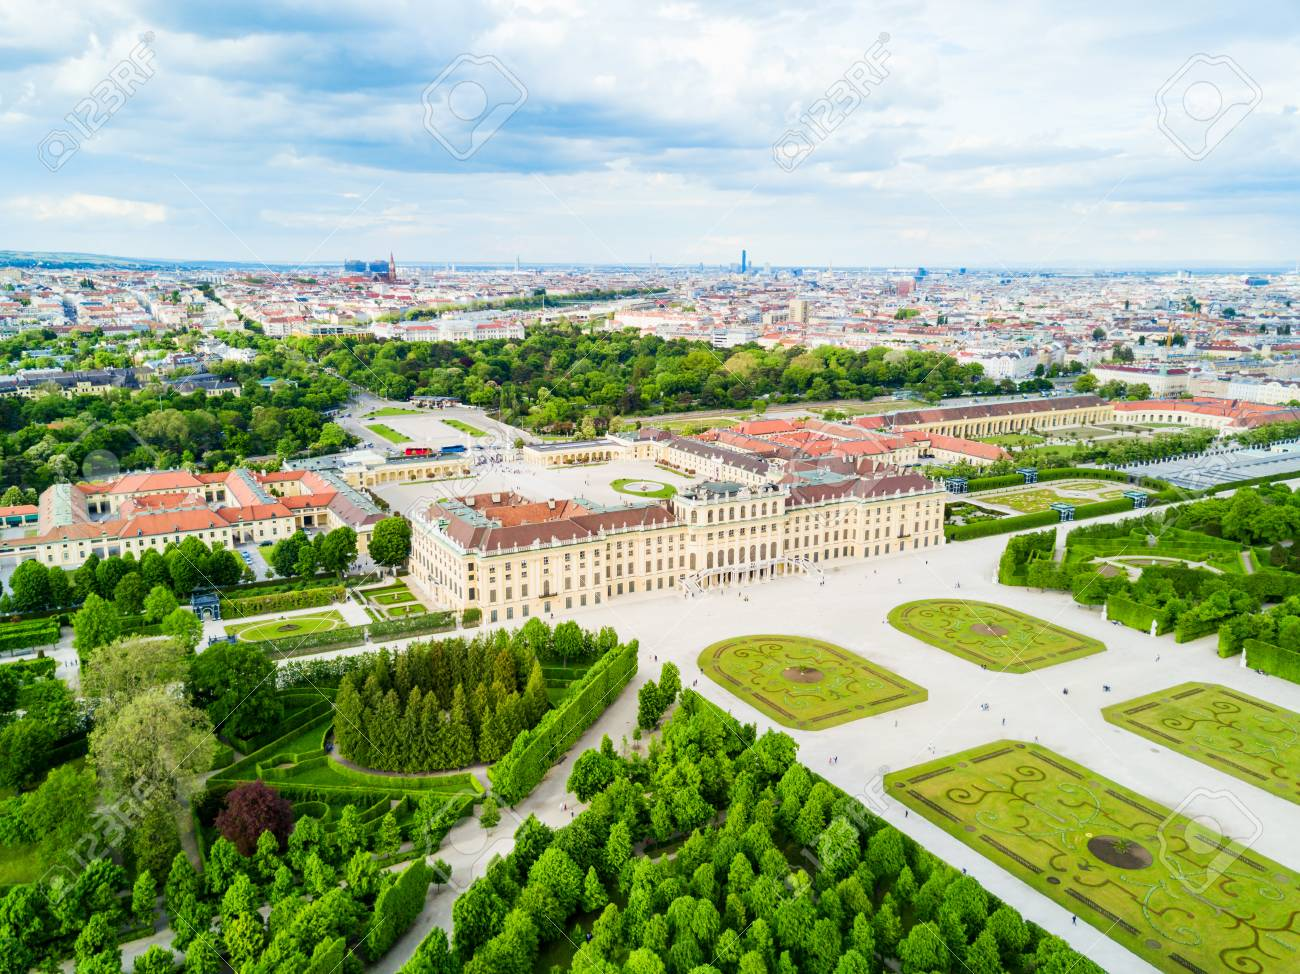 Schonbrunn Palace aerial panoramic view. Schloss Schoenbrunn is an imperial summer residence in Vienna, Austria. Schonbrunn Palace is a major tourist attraction in Vienna, Austria. - 92678406